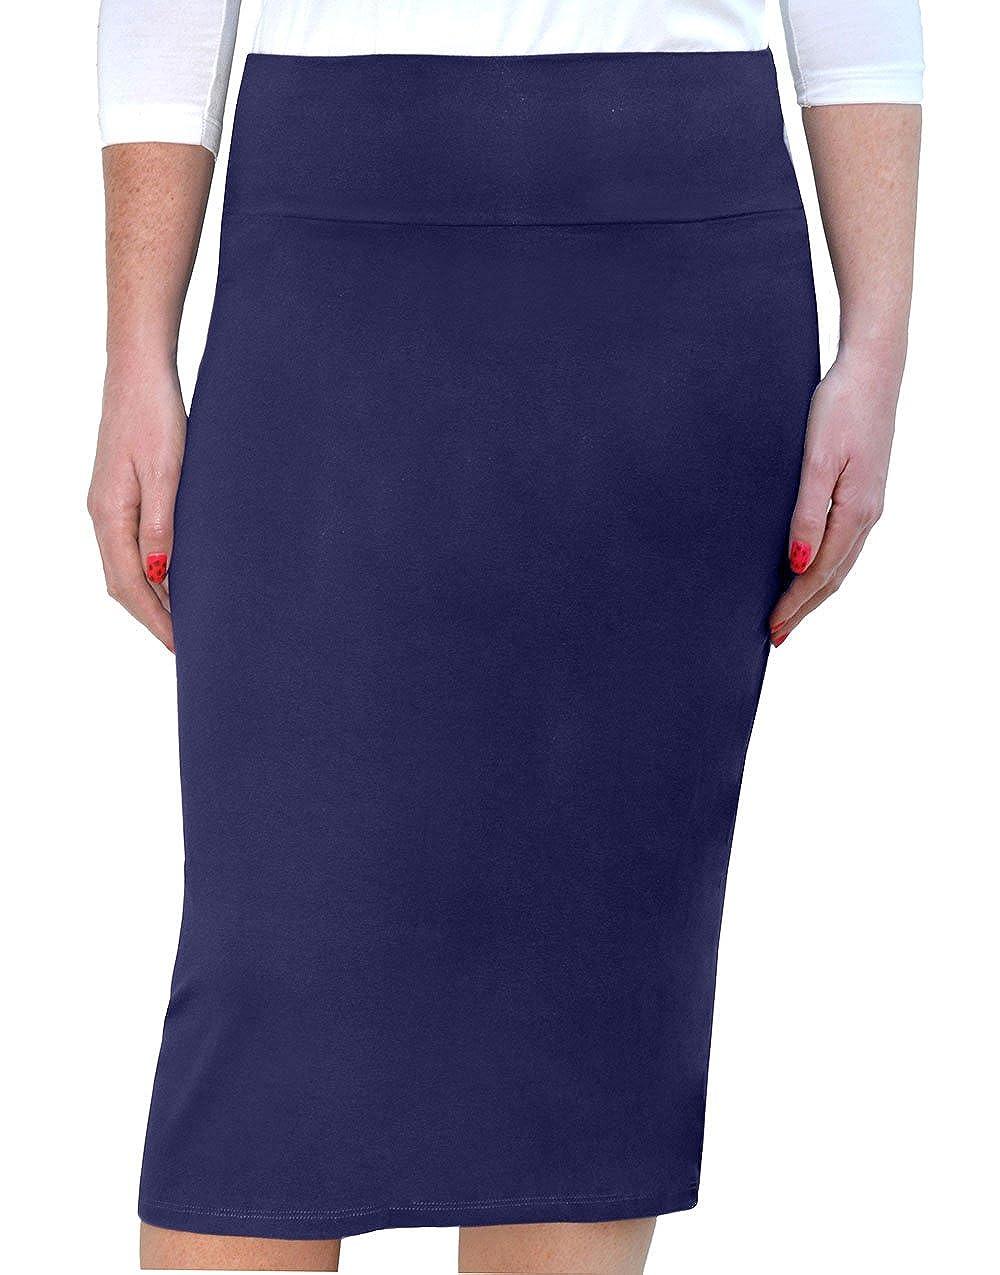 a8ac603a31 Amazon.com: Kosher Casual Kids Big Girls' Knee Length Ultra Lightweight Stretchy  Pencil Skirt: Clothing